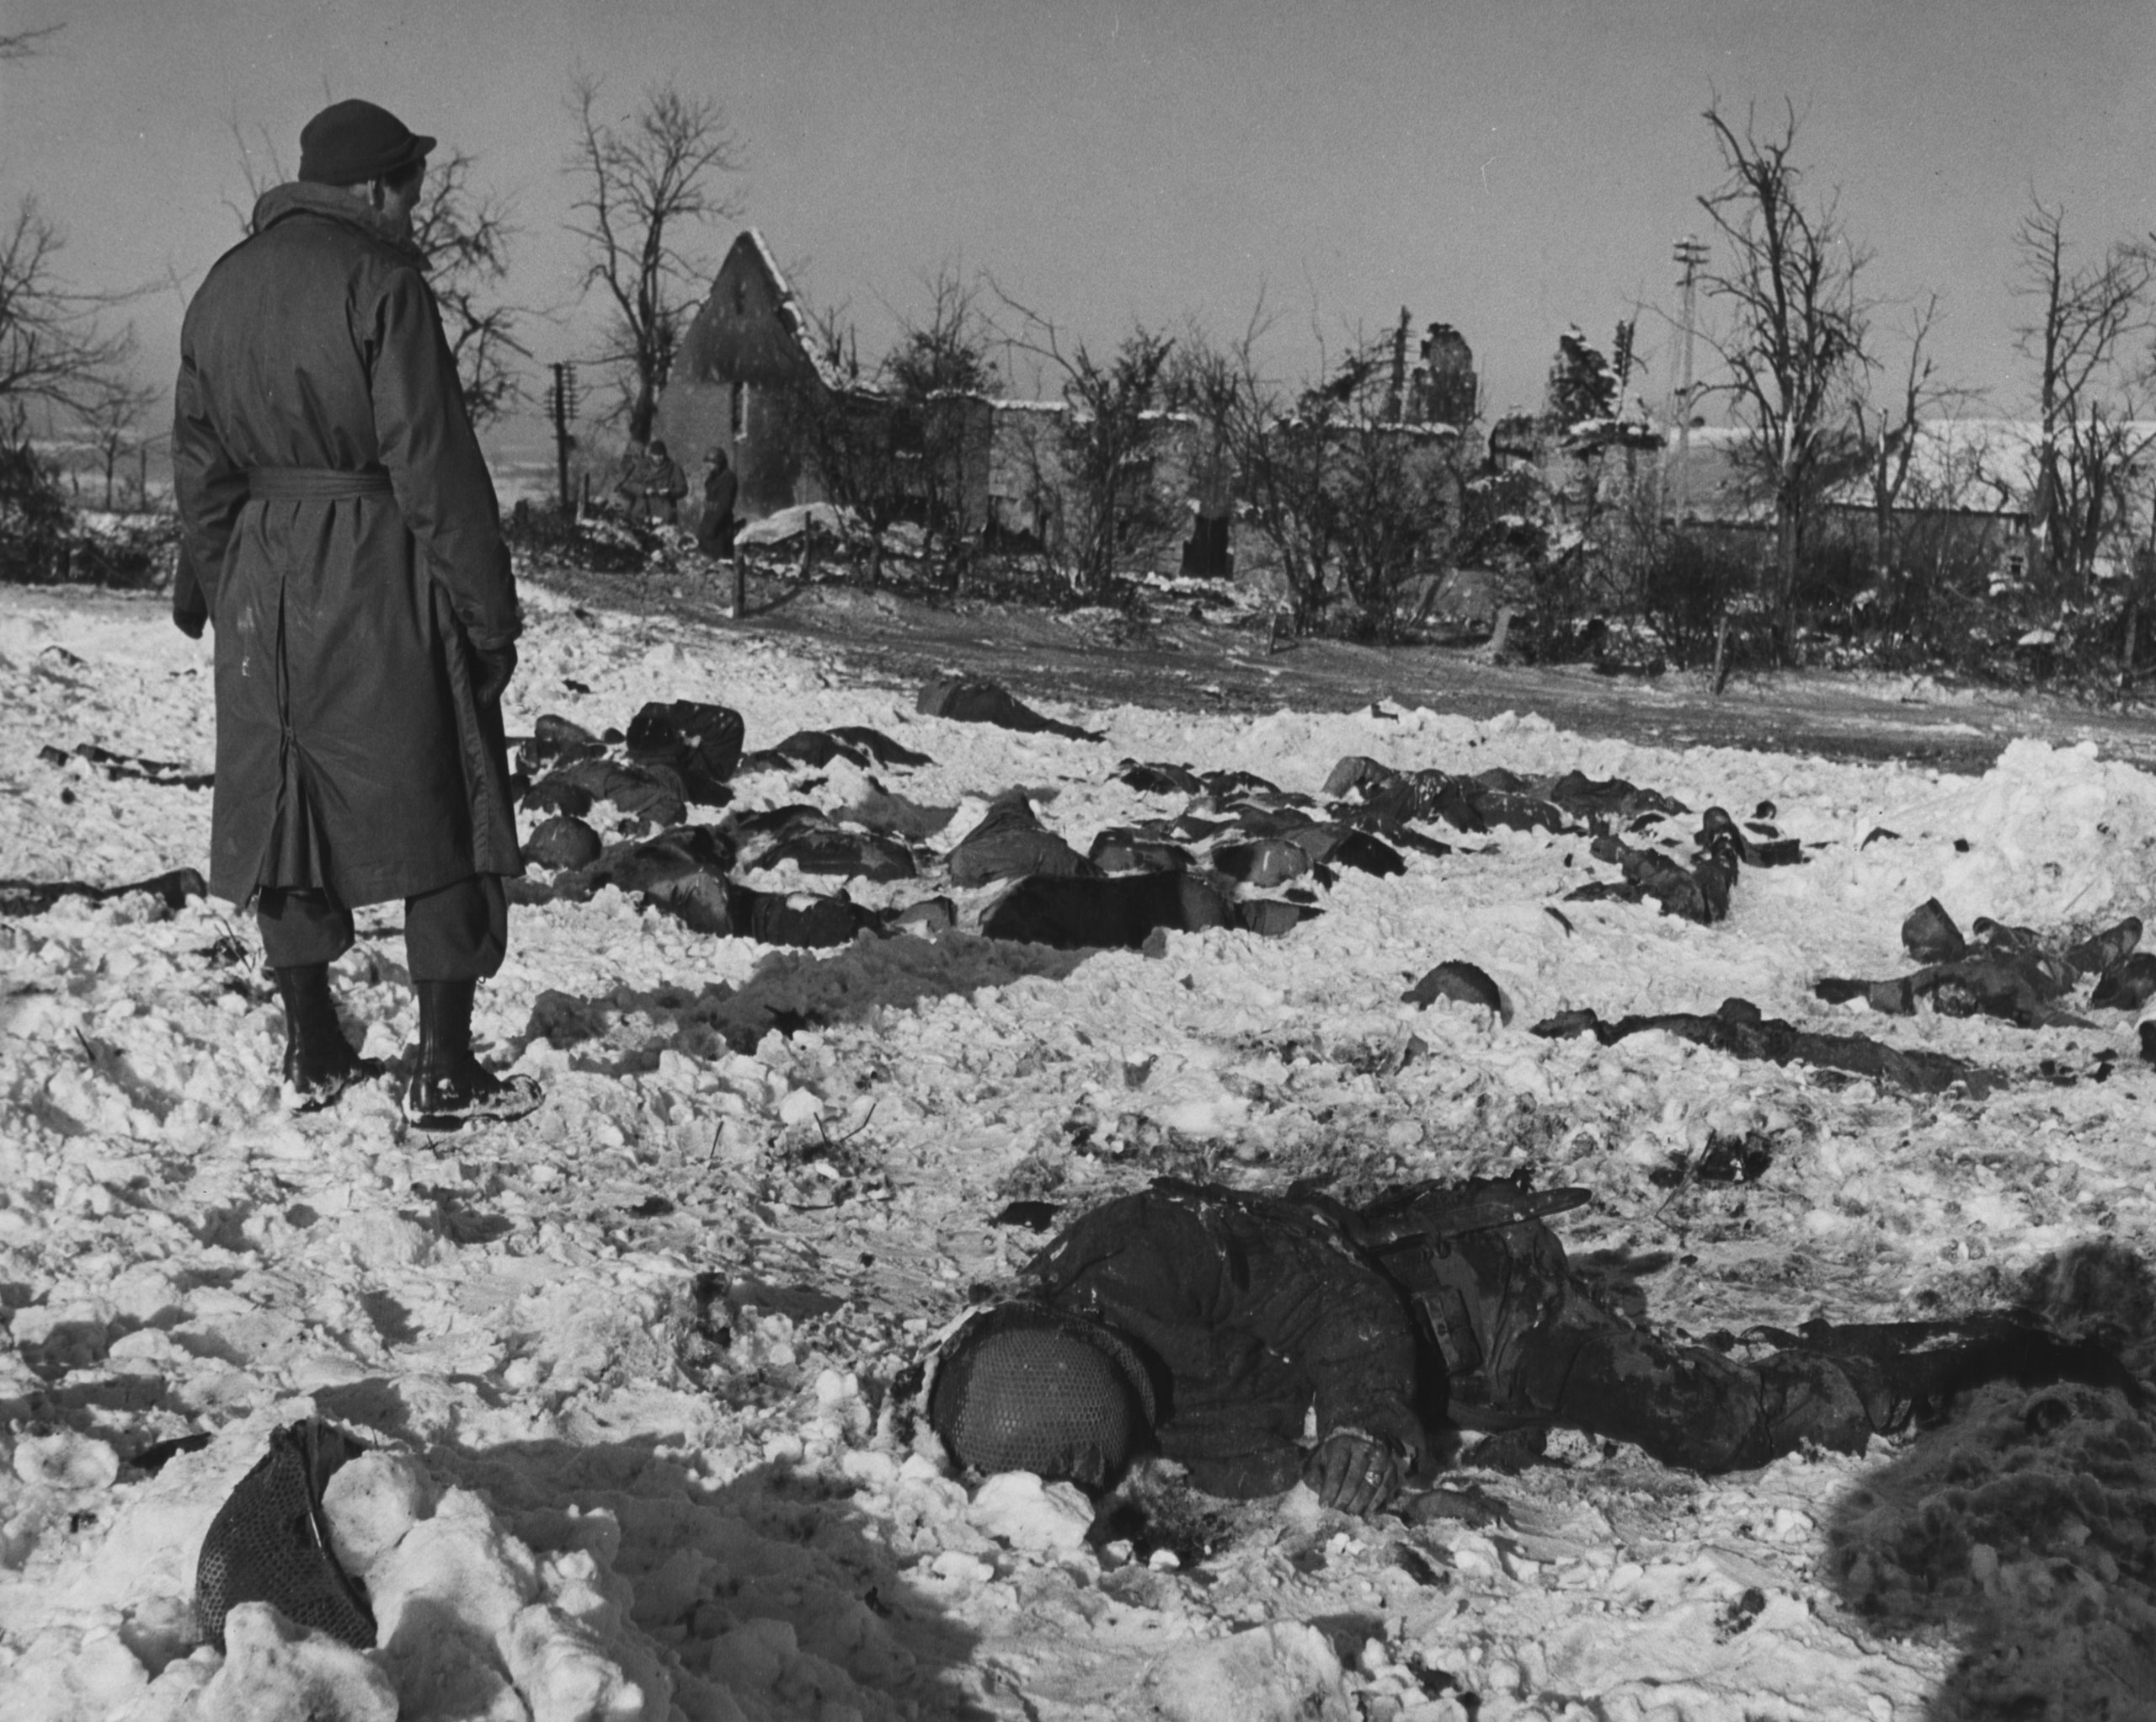 Aftermath of the Malmedy massacre (1944)